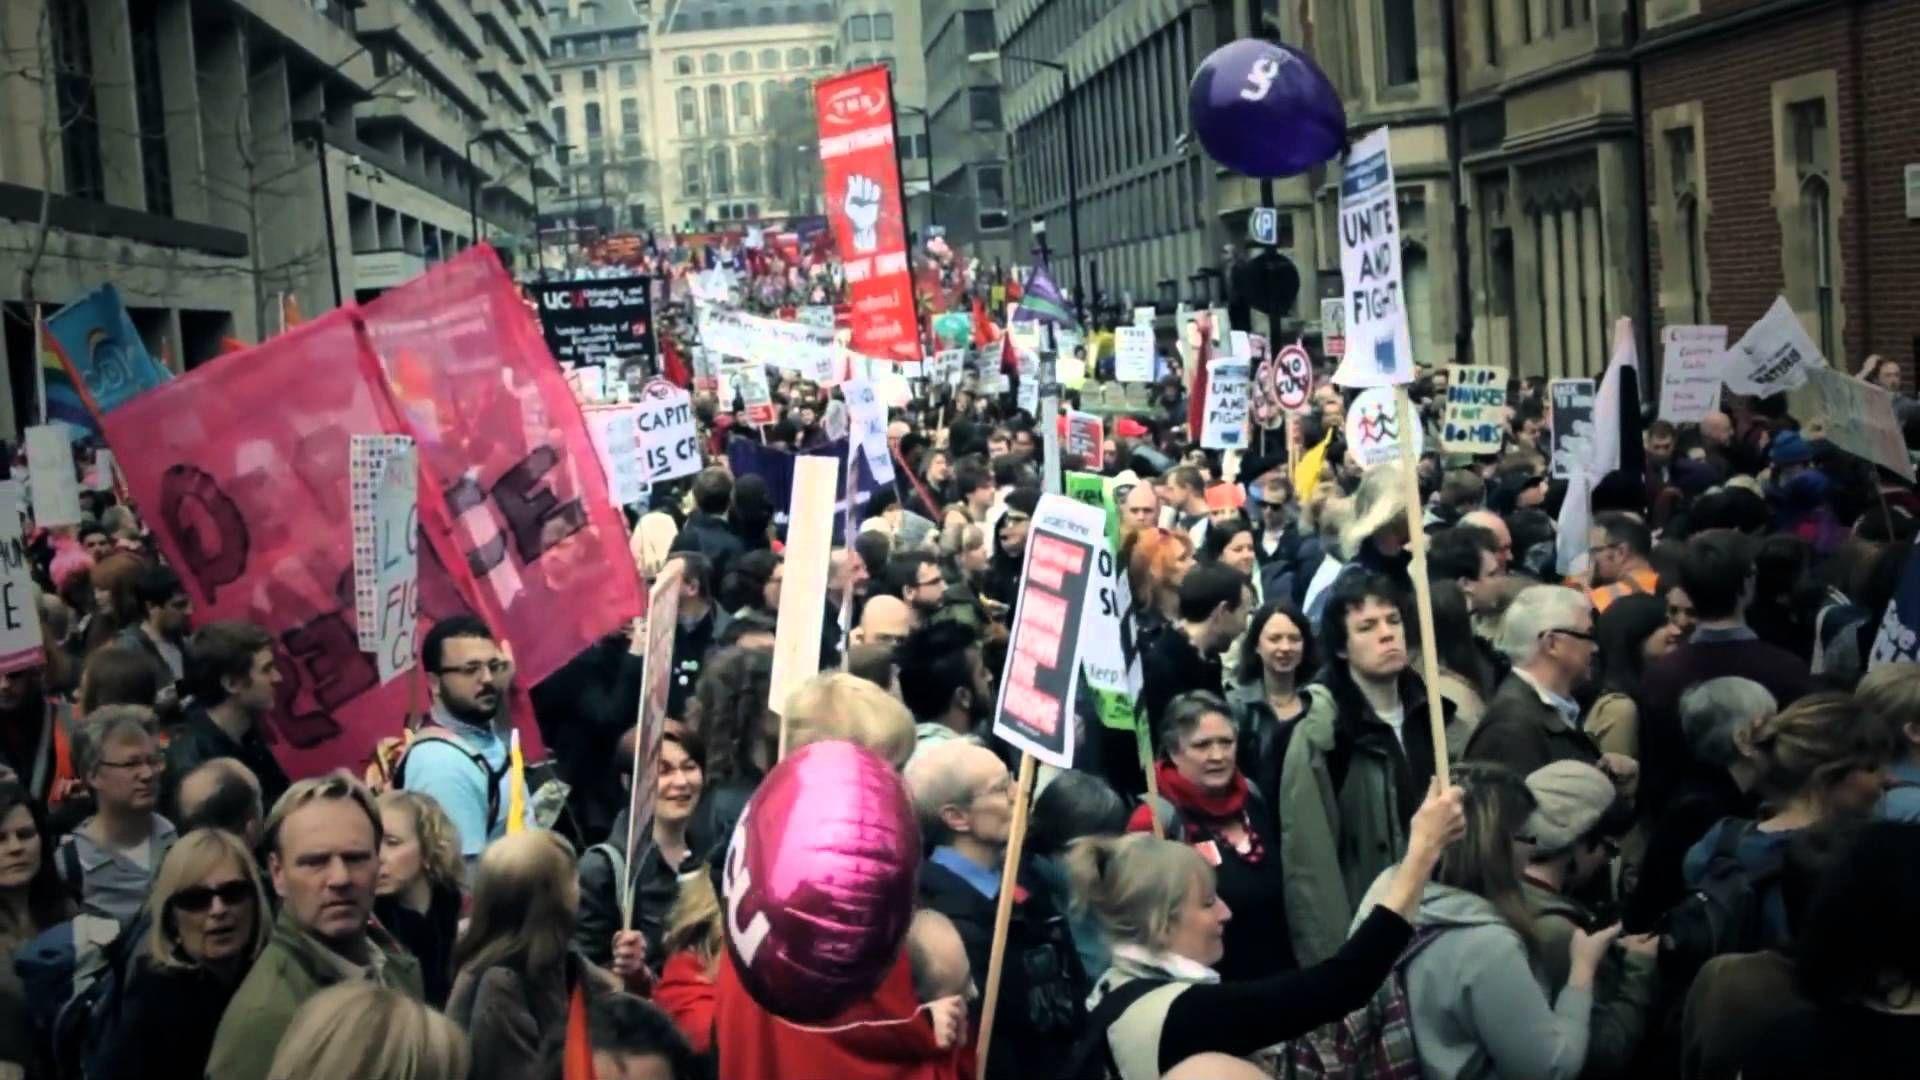 Austerity vs possibilty build a better world austerity